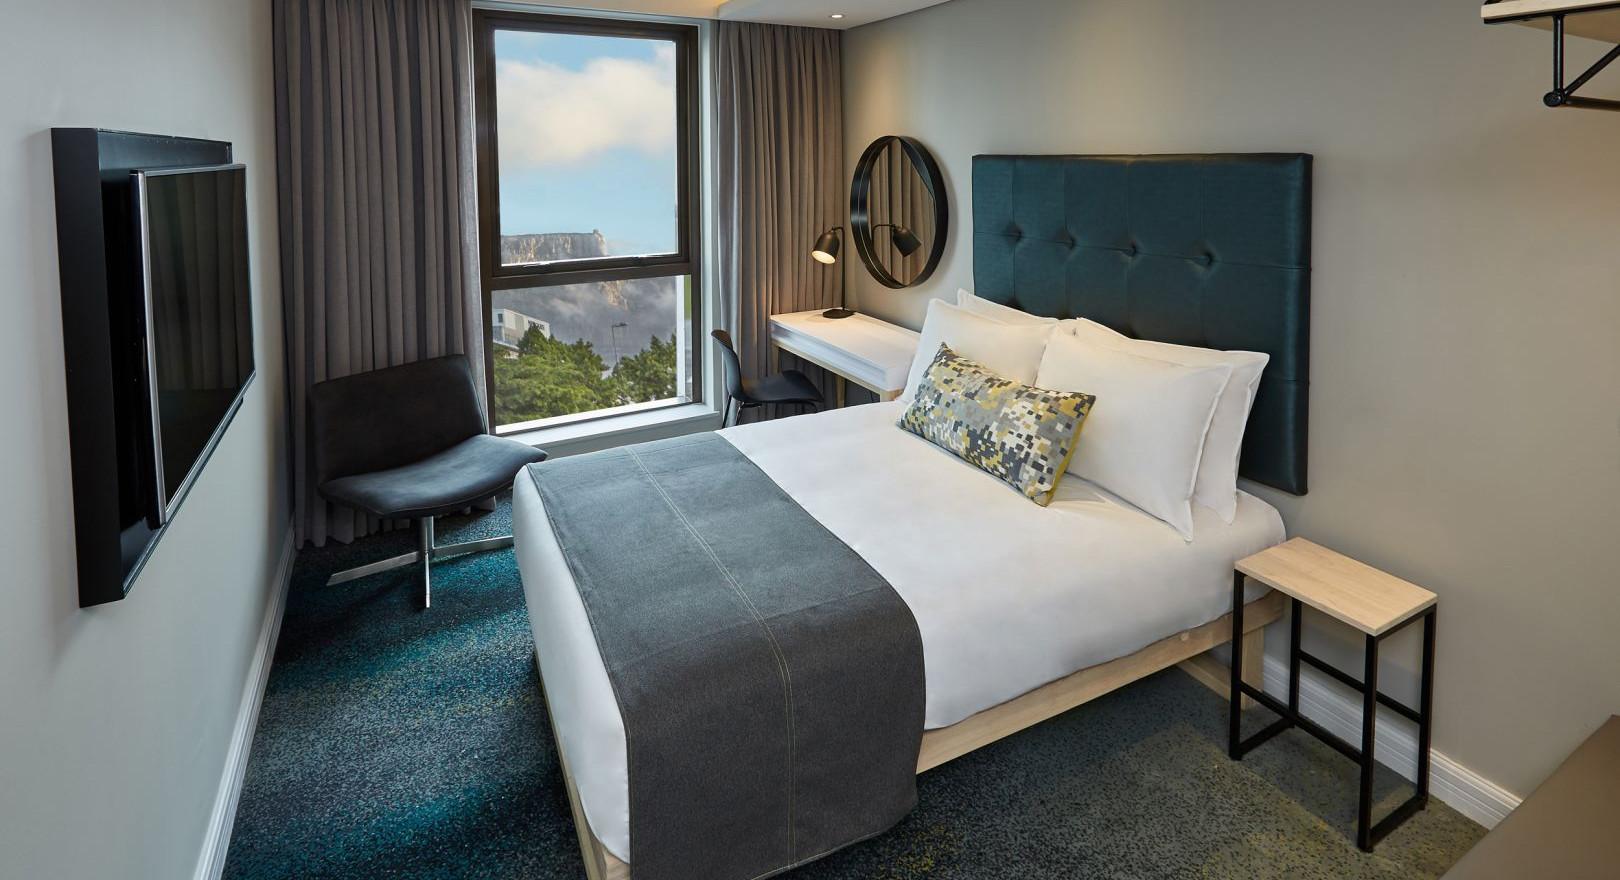 Stay Easy Hotel